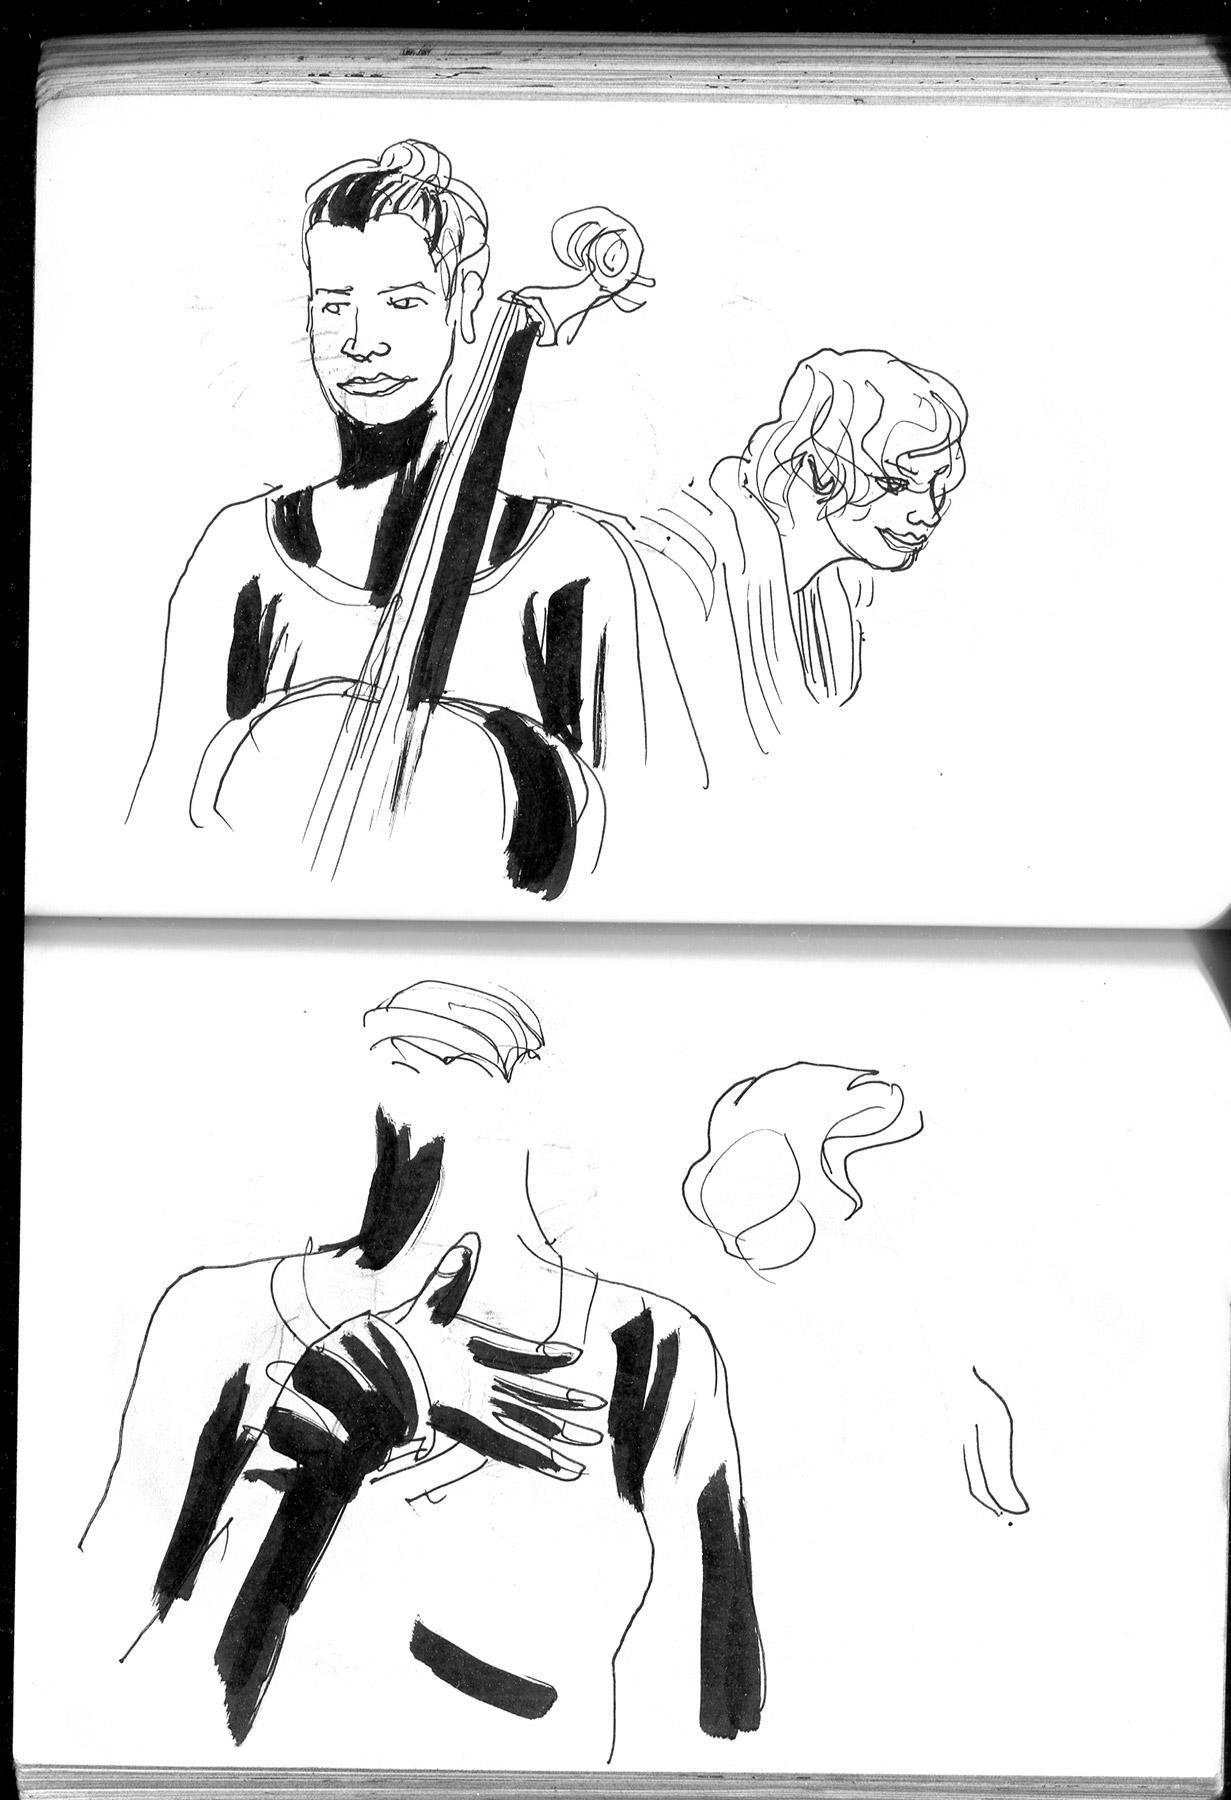 davidm_sketches_2014_08-053.jpg